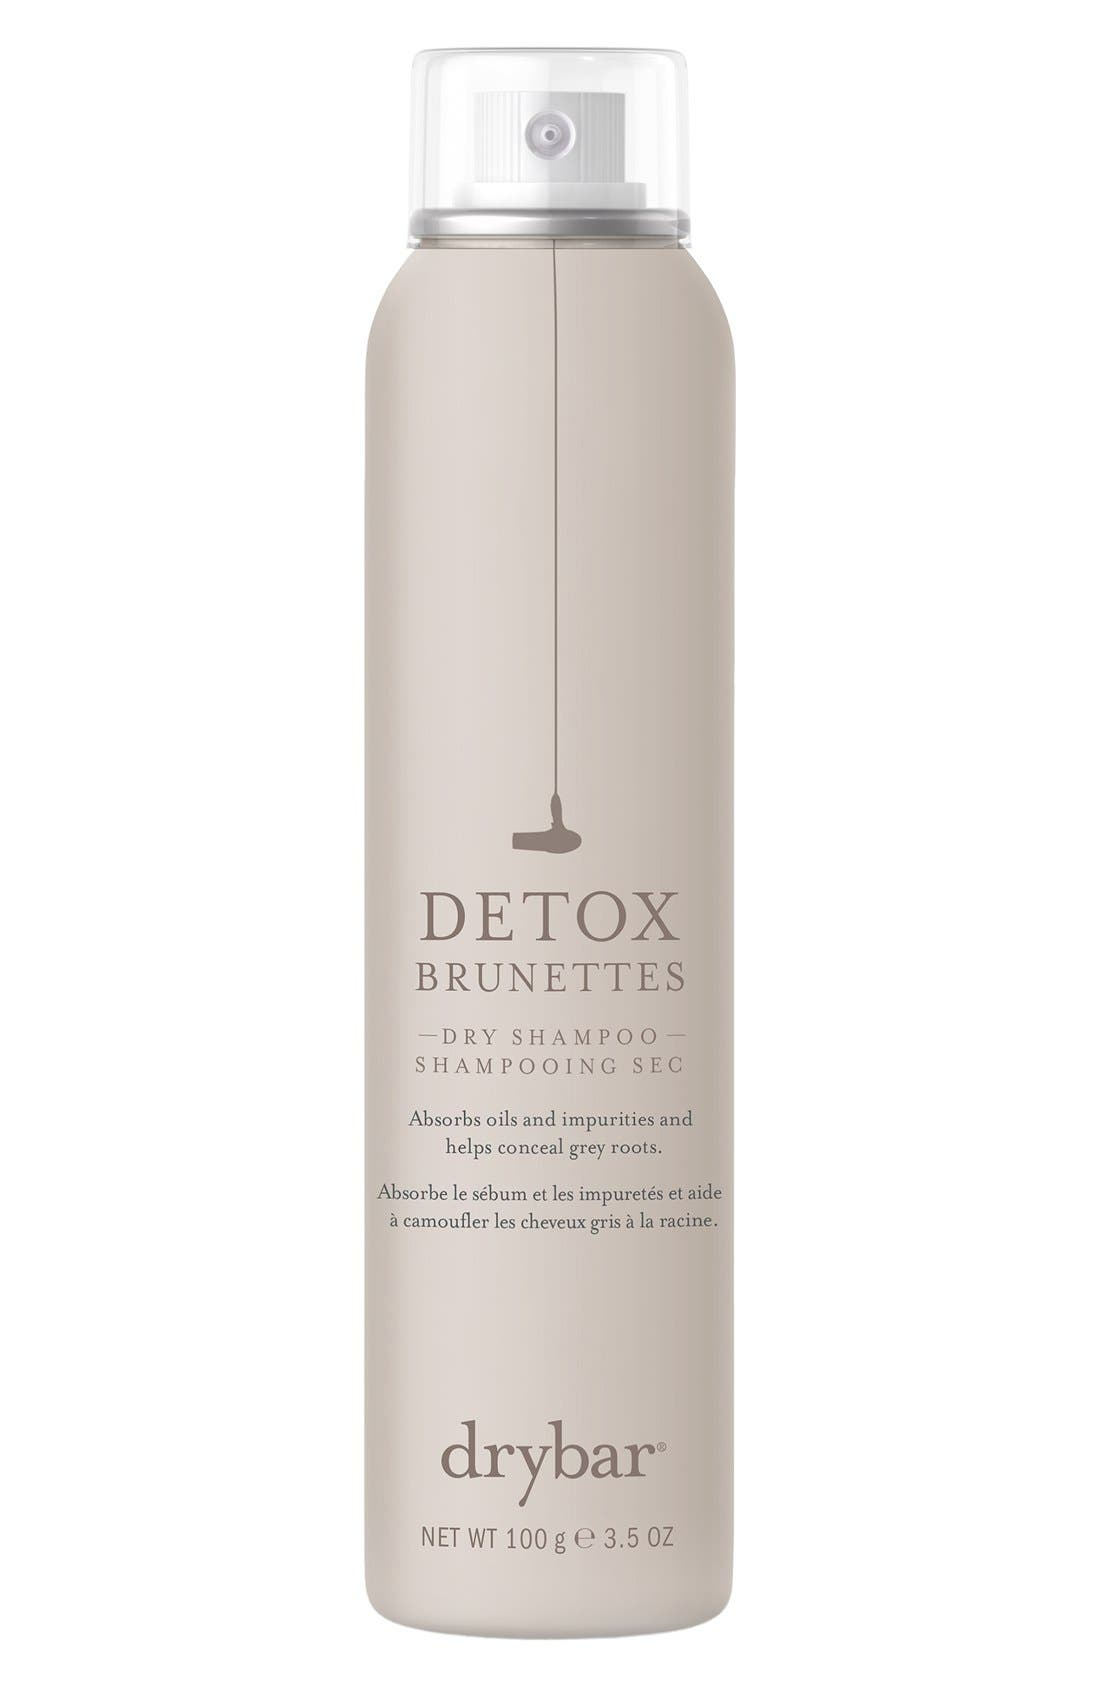 'Detox' Dry Shampoo for Brunettes,                             Main thumbnail 1, color,                             NO COLOR